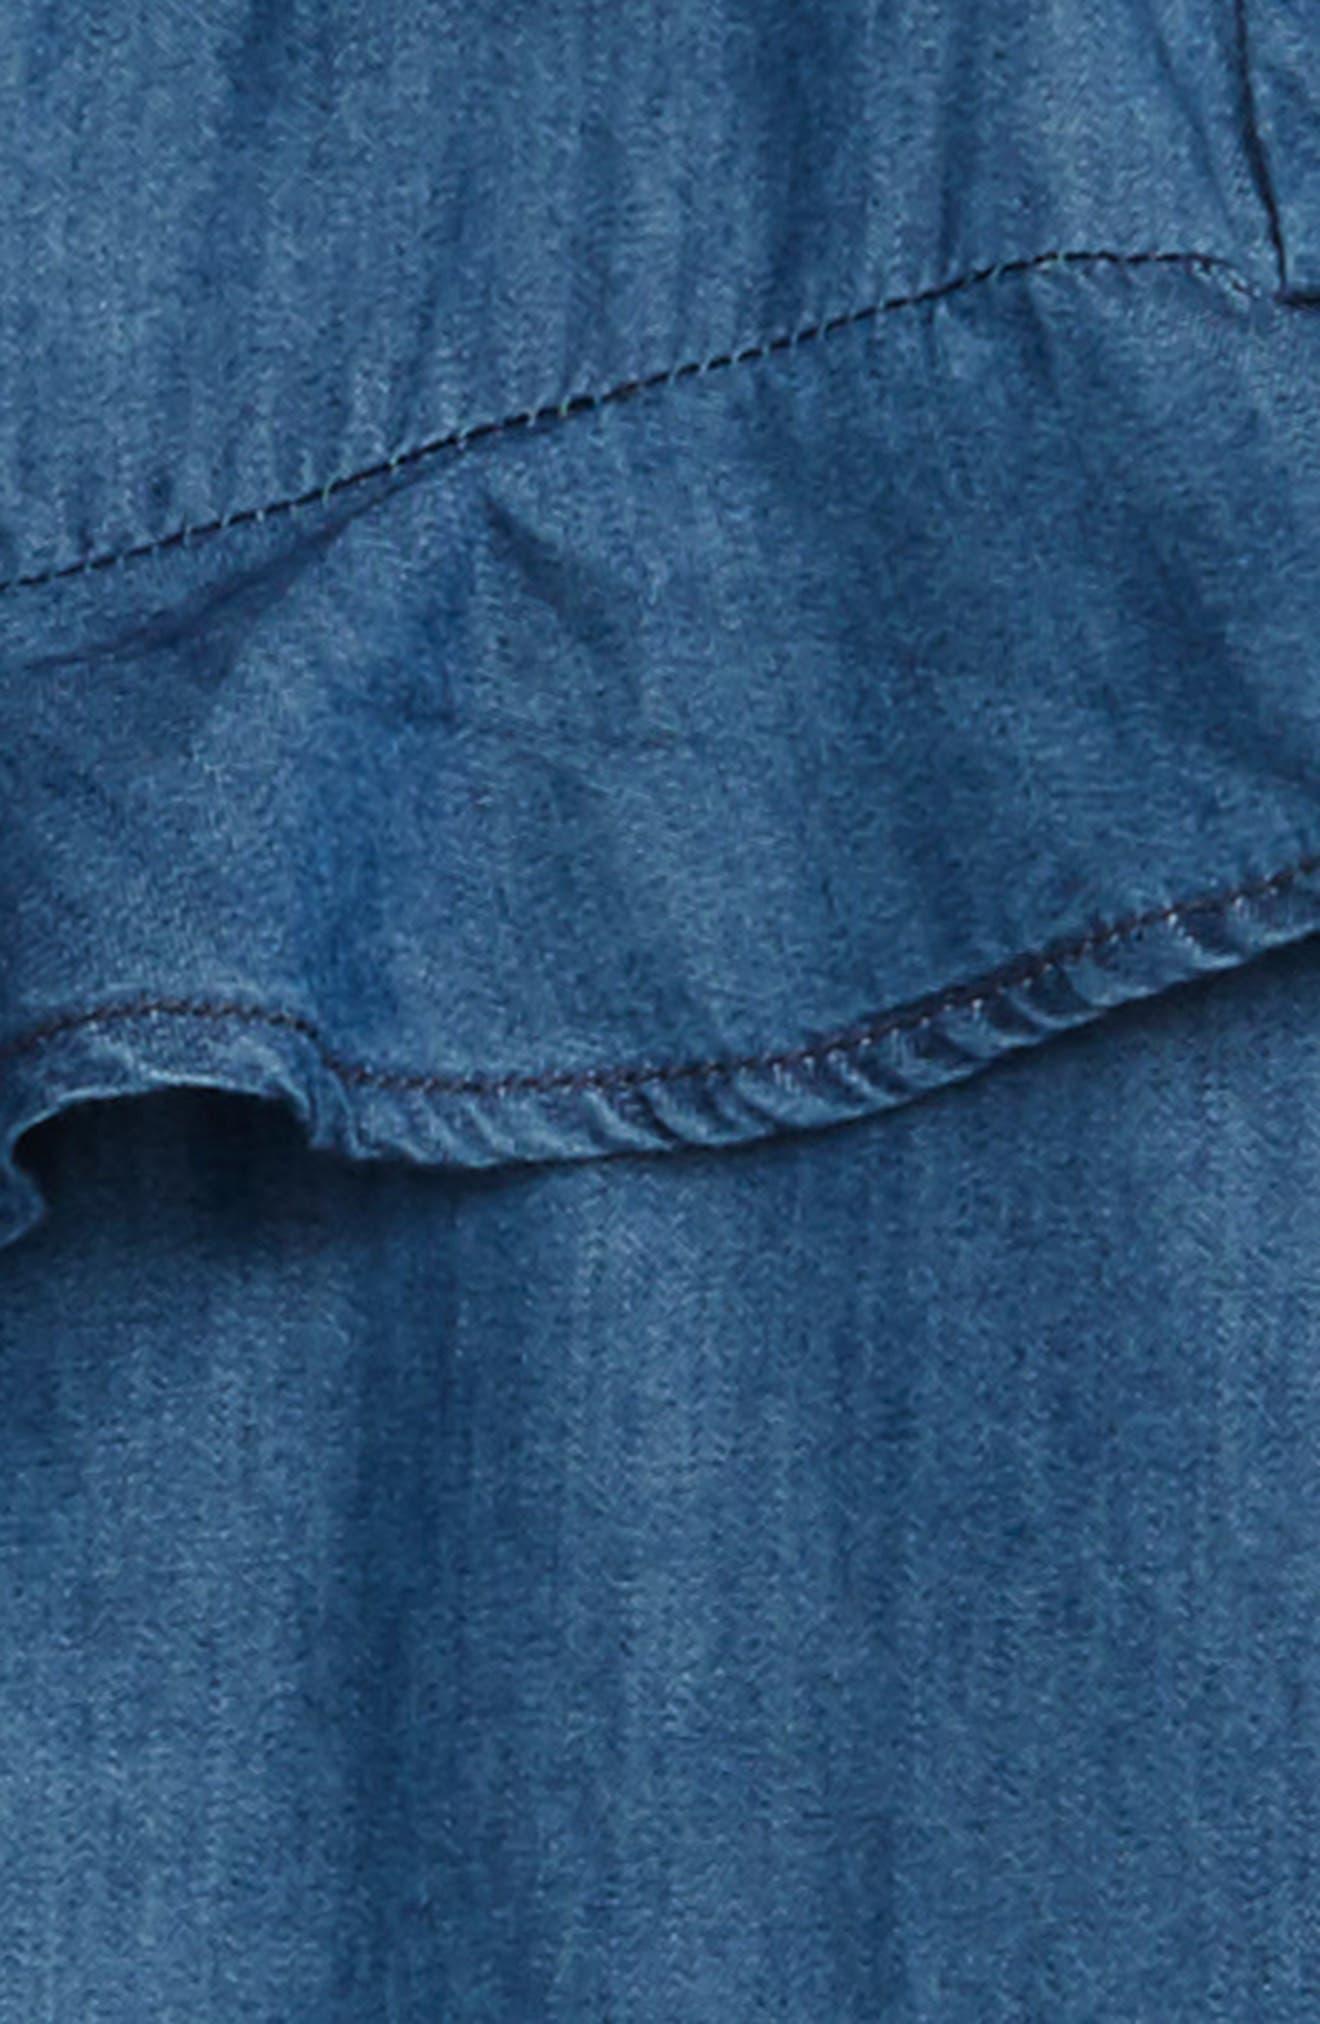 Ruffle Denim Jacket,                             Alternate thumbnail 2, color,                             Host Wash Blue